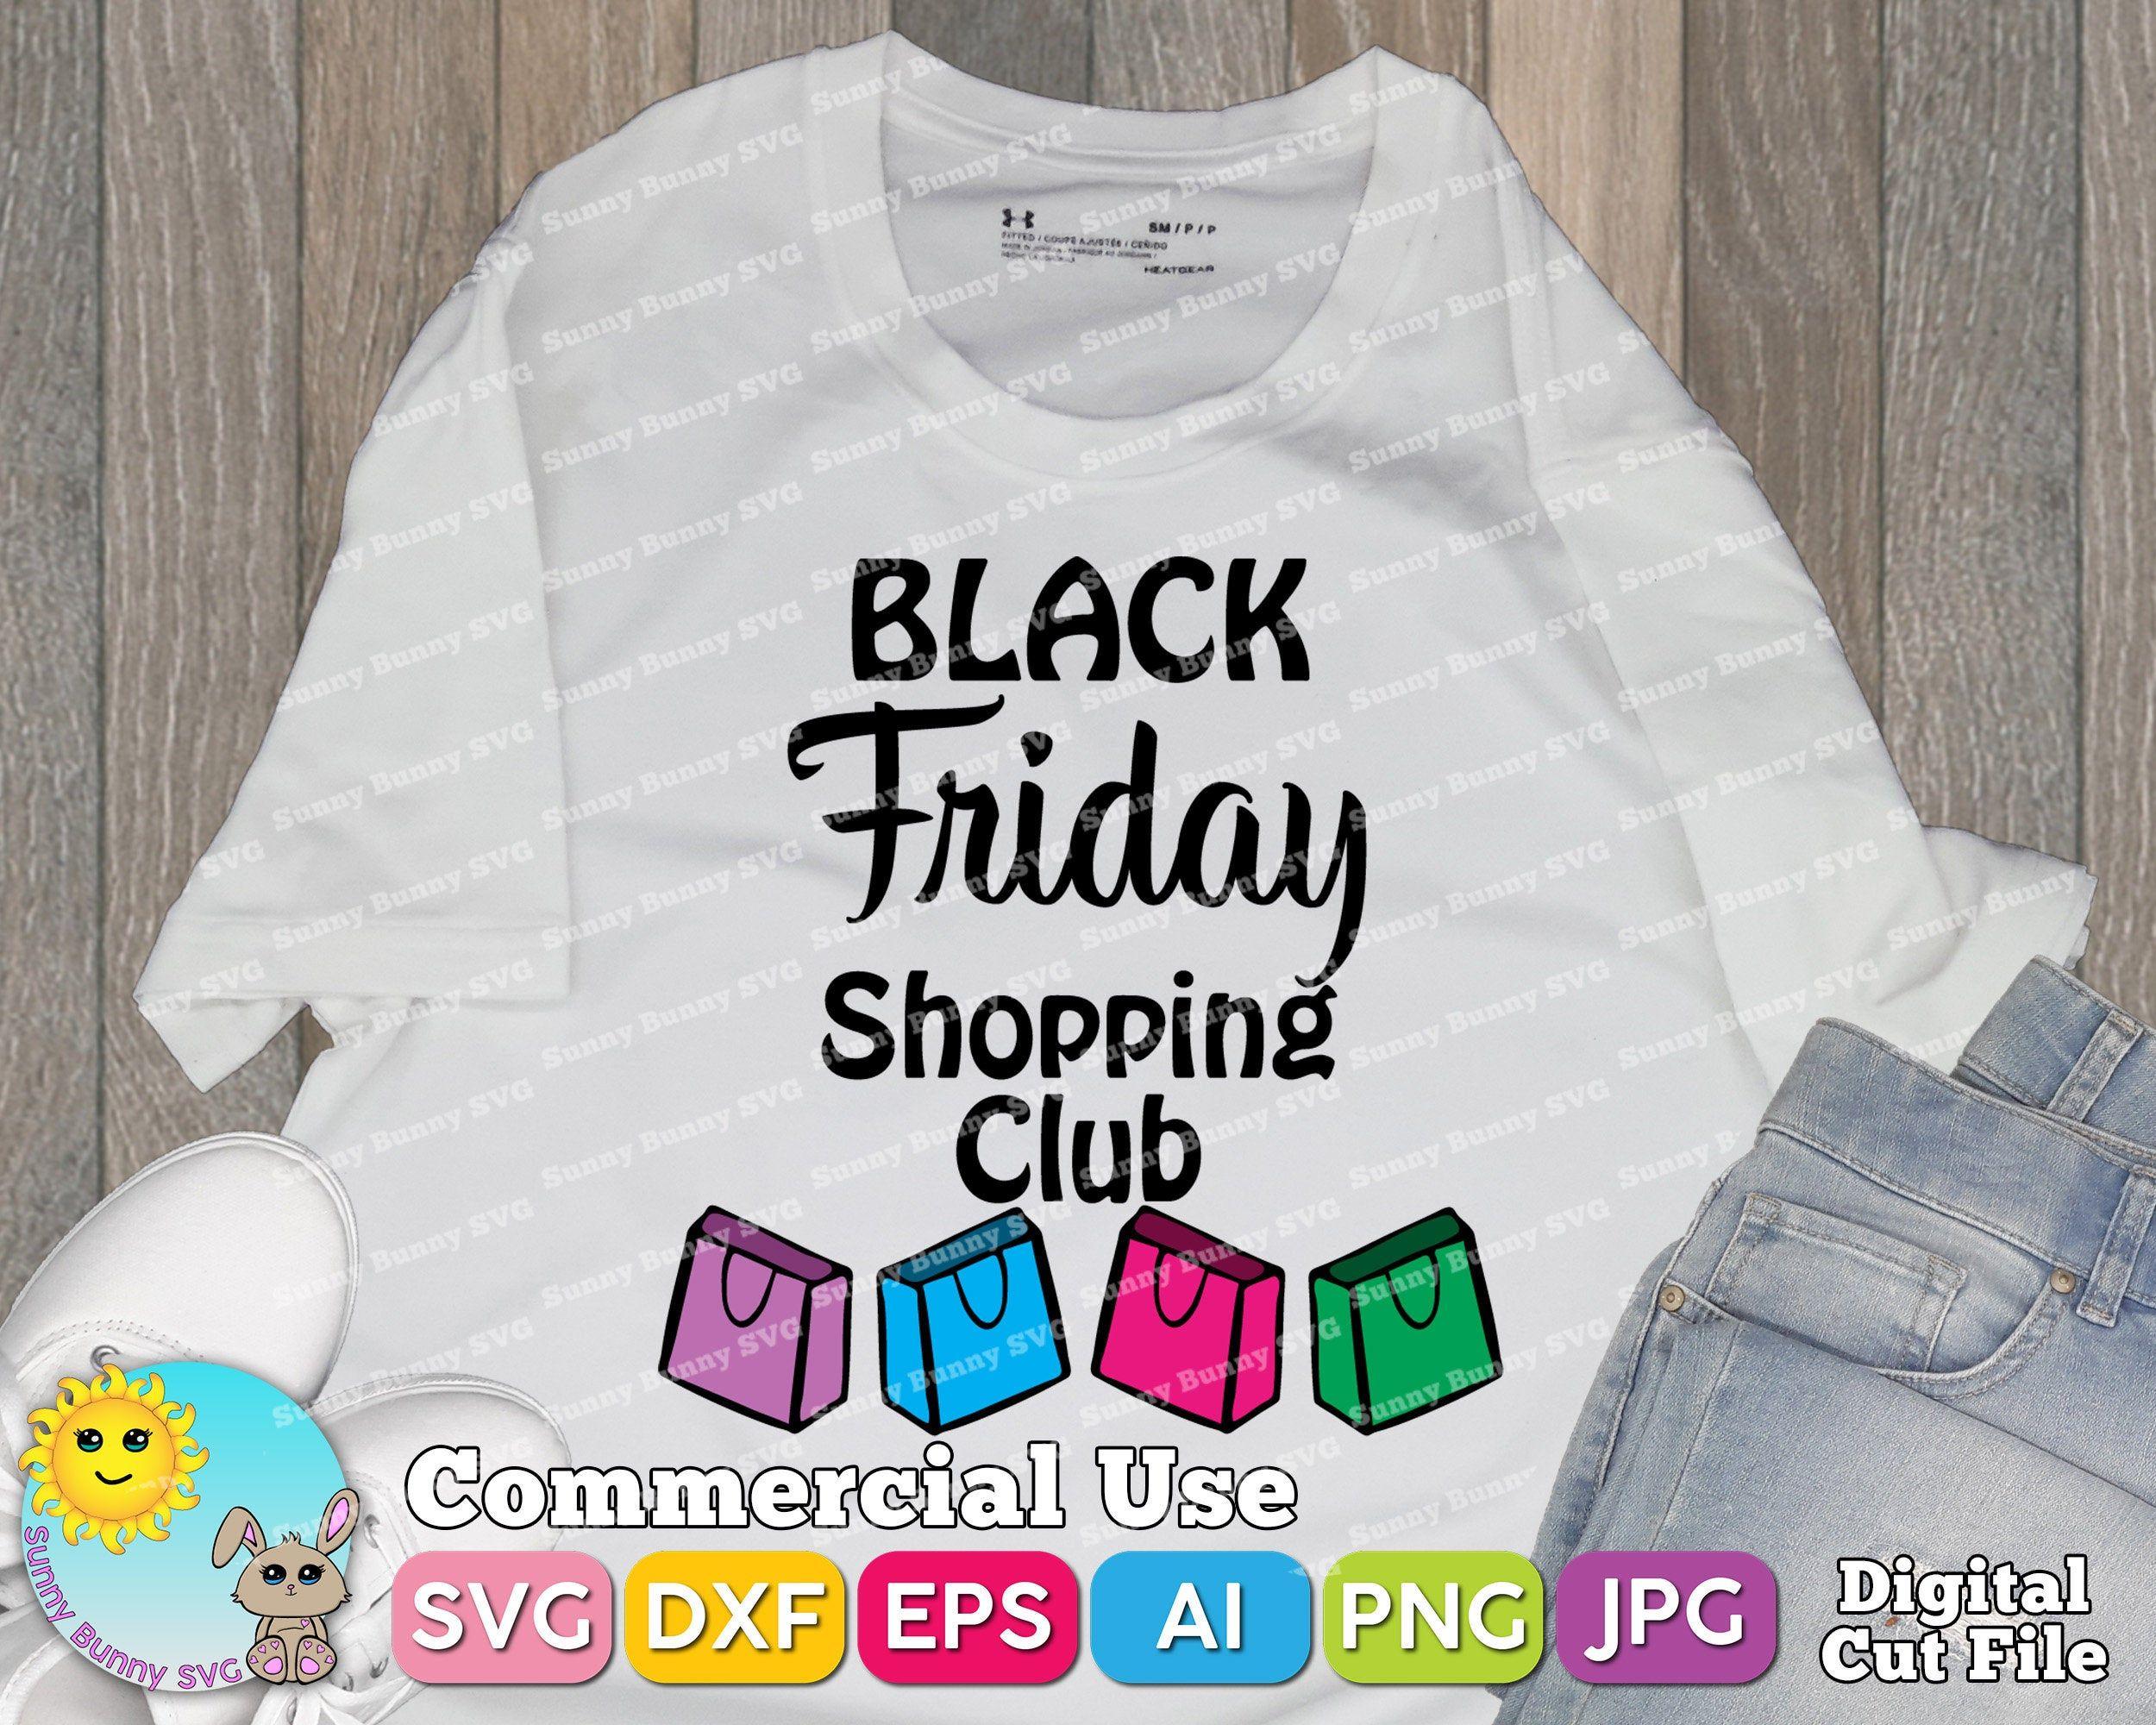 Black Friday Shopping Club shirt svg dxf eps ai png jpg digital cut file